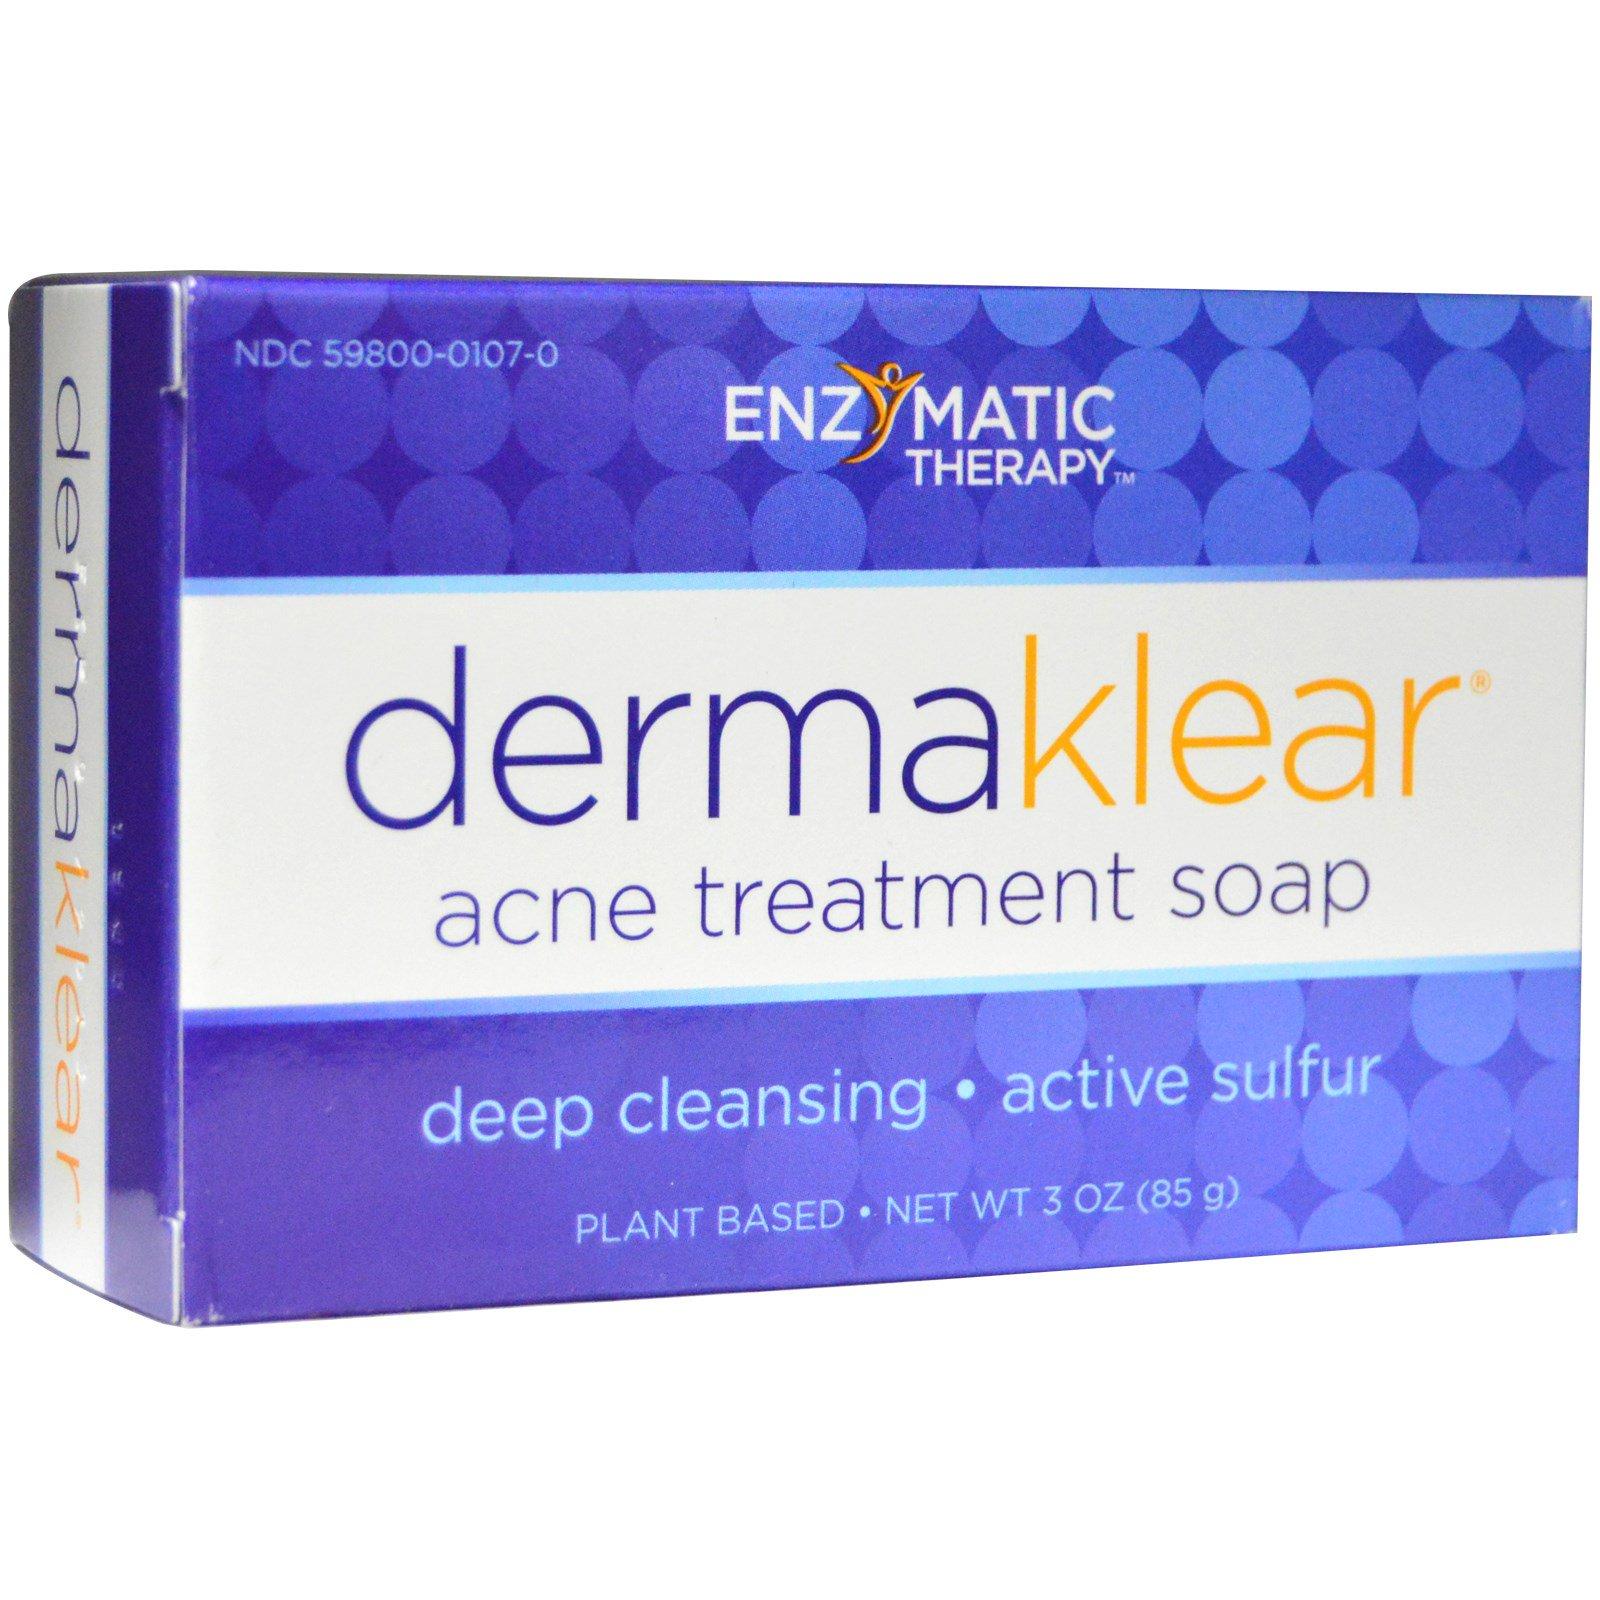 Enzymatic Therapy, DermaKlear Acne Treatment Soap, 3 oz (85 g)